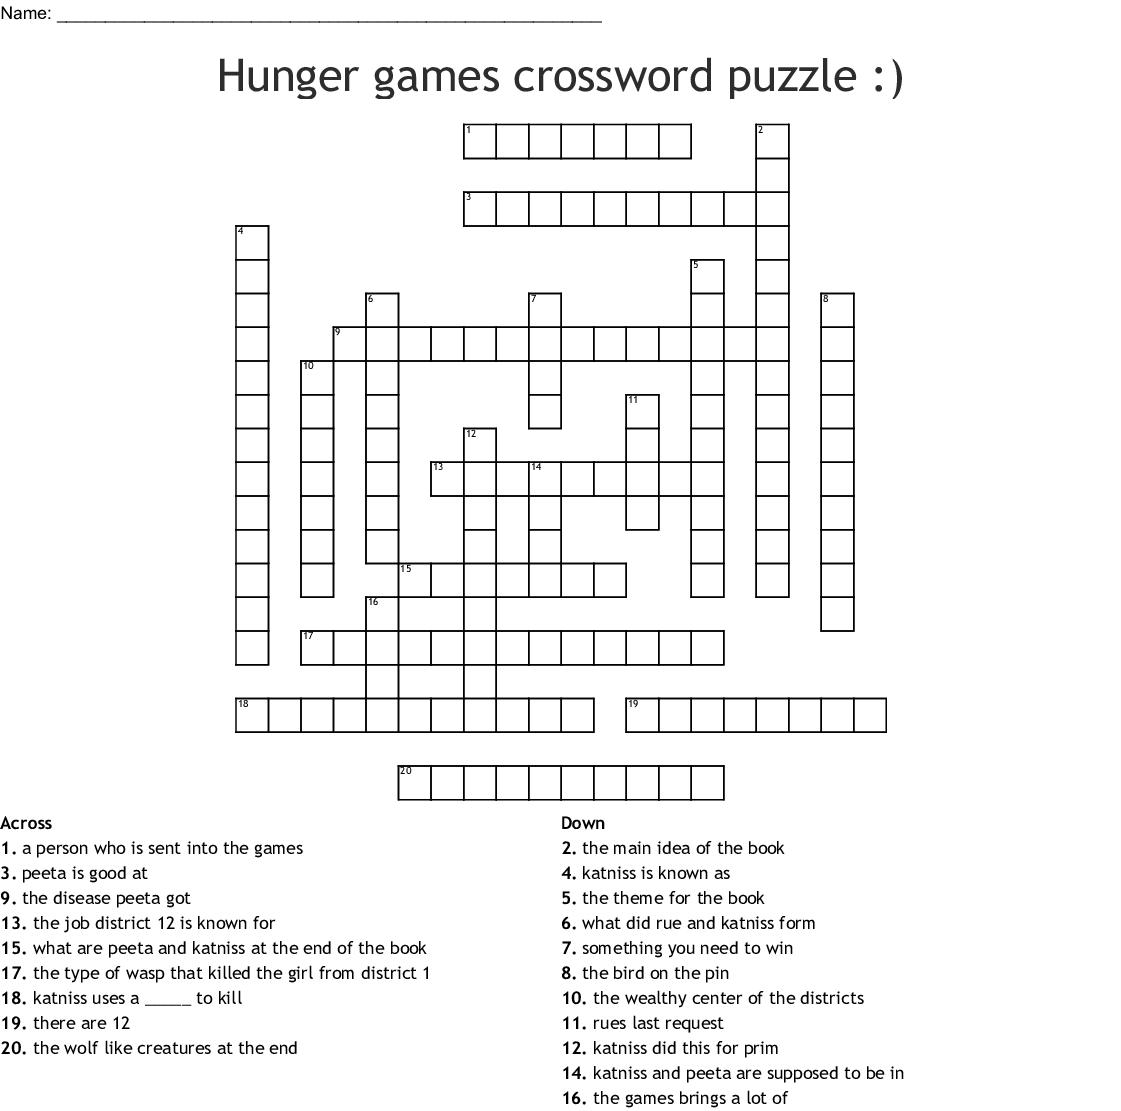 Hunger Games Crossword Puzzle Crossword